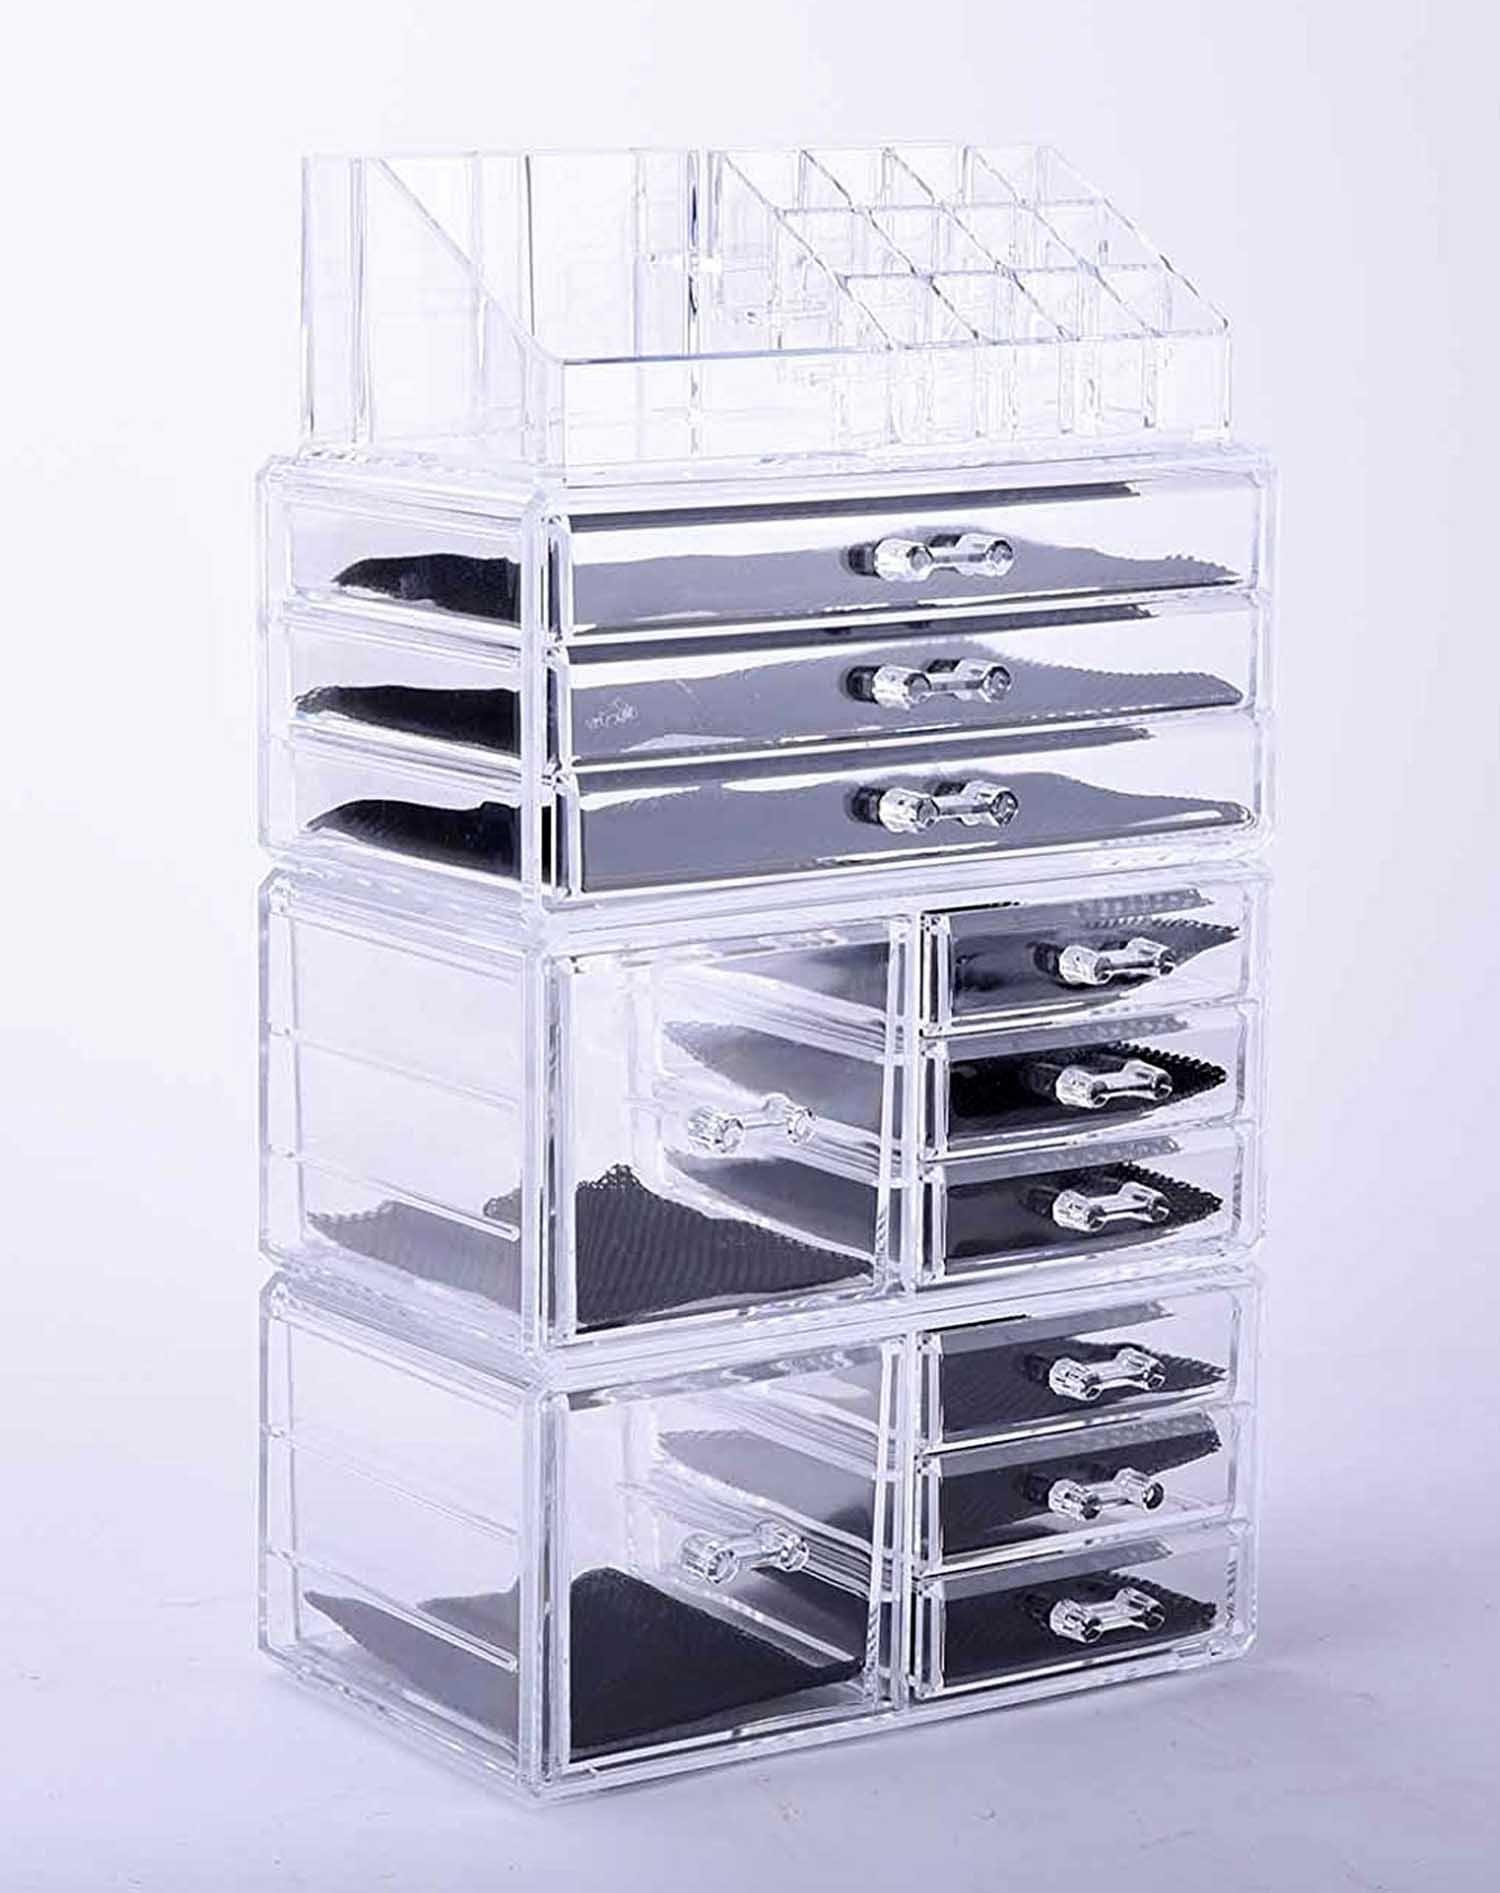 Vencer Jewelry and Cosmetic Storage Makeup Organizer Set,4 Piece,VMO-021